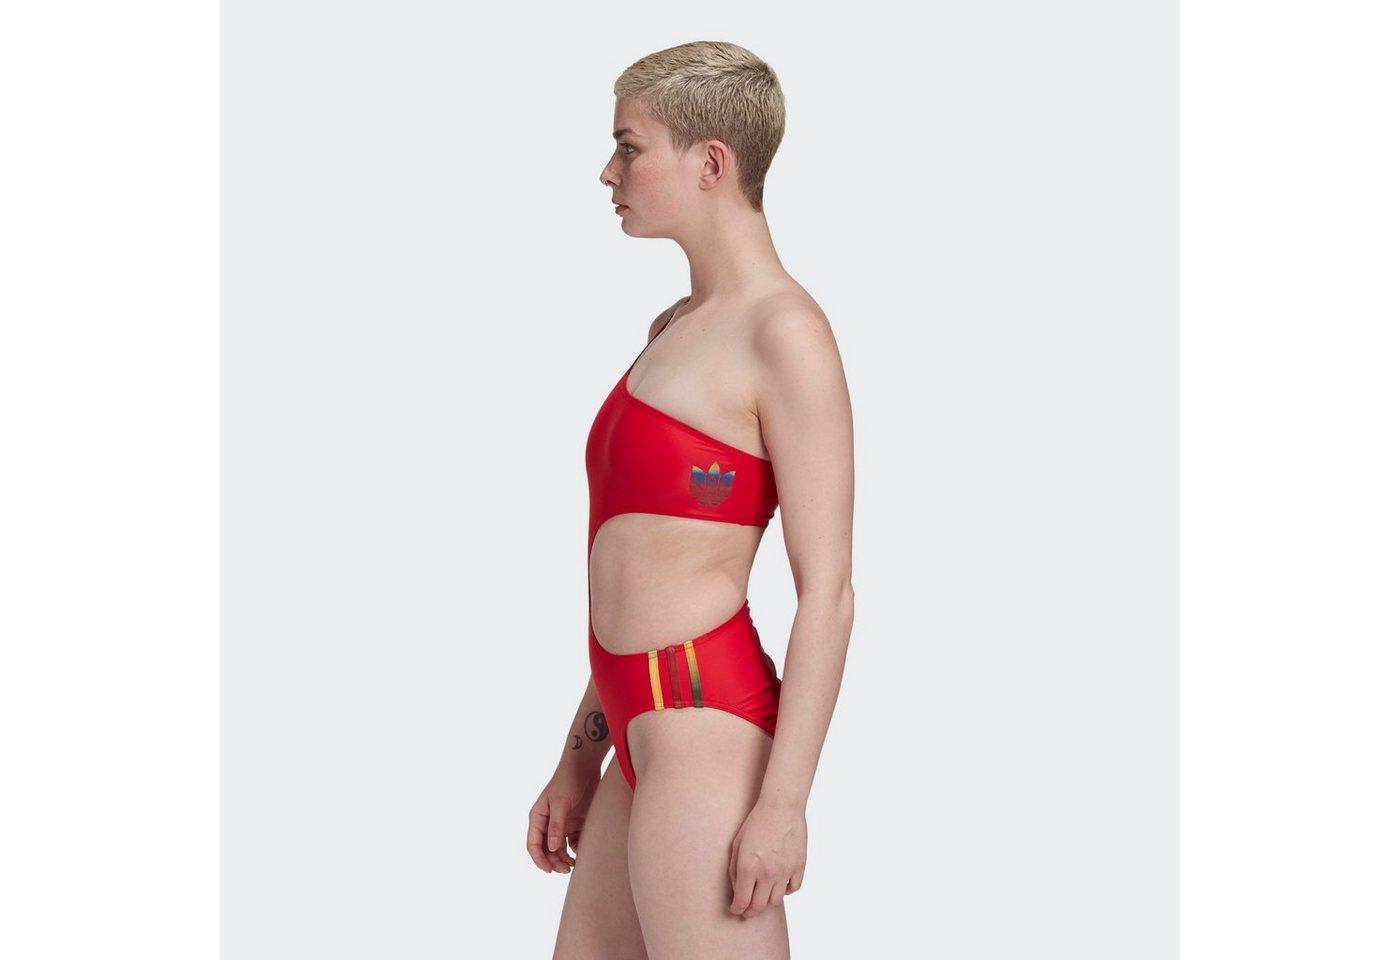 Bademode - adidas Originals Badeanzug »Adicolor 3D Trefoil Badeanzug« ›  - Onlineshop OTTO